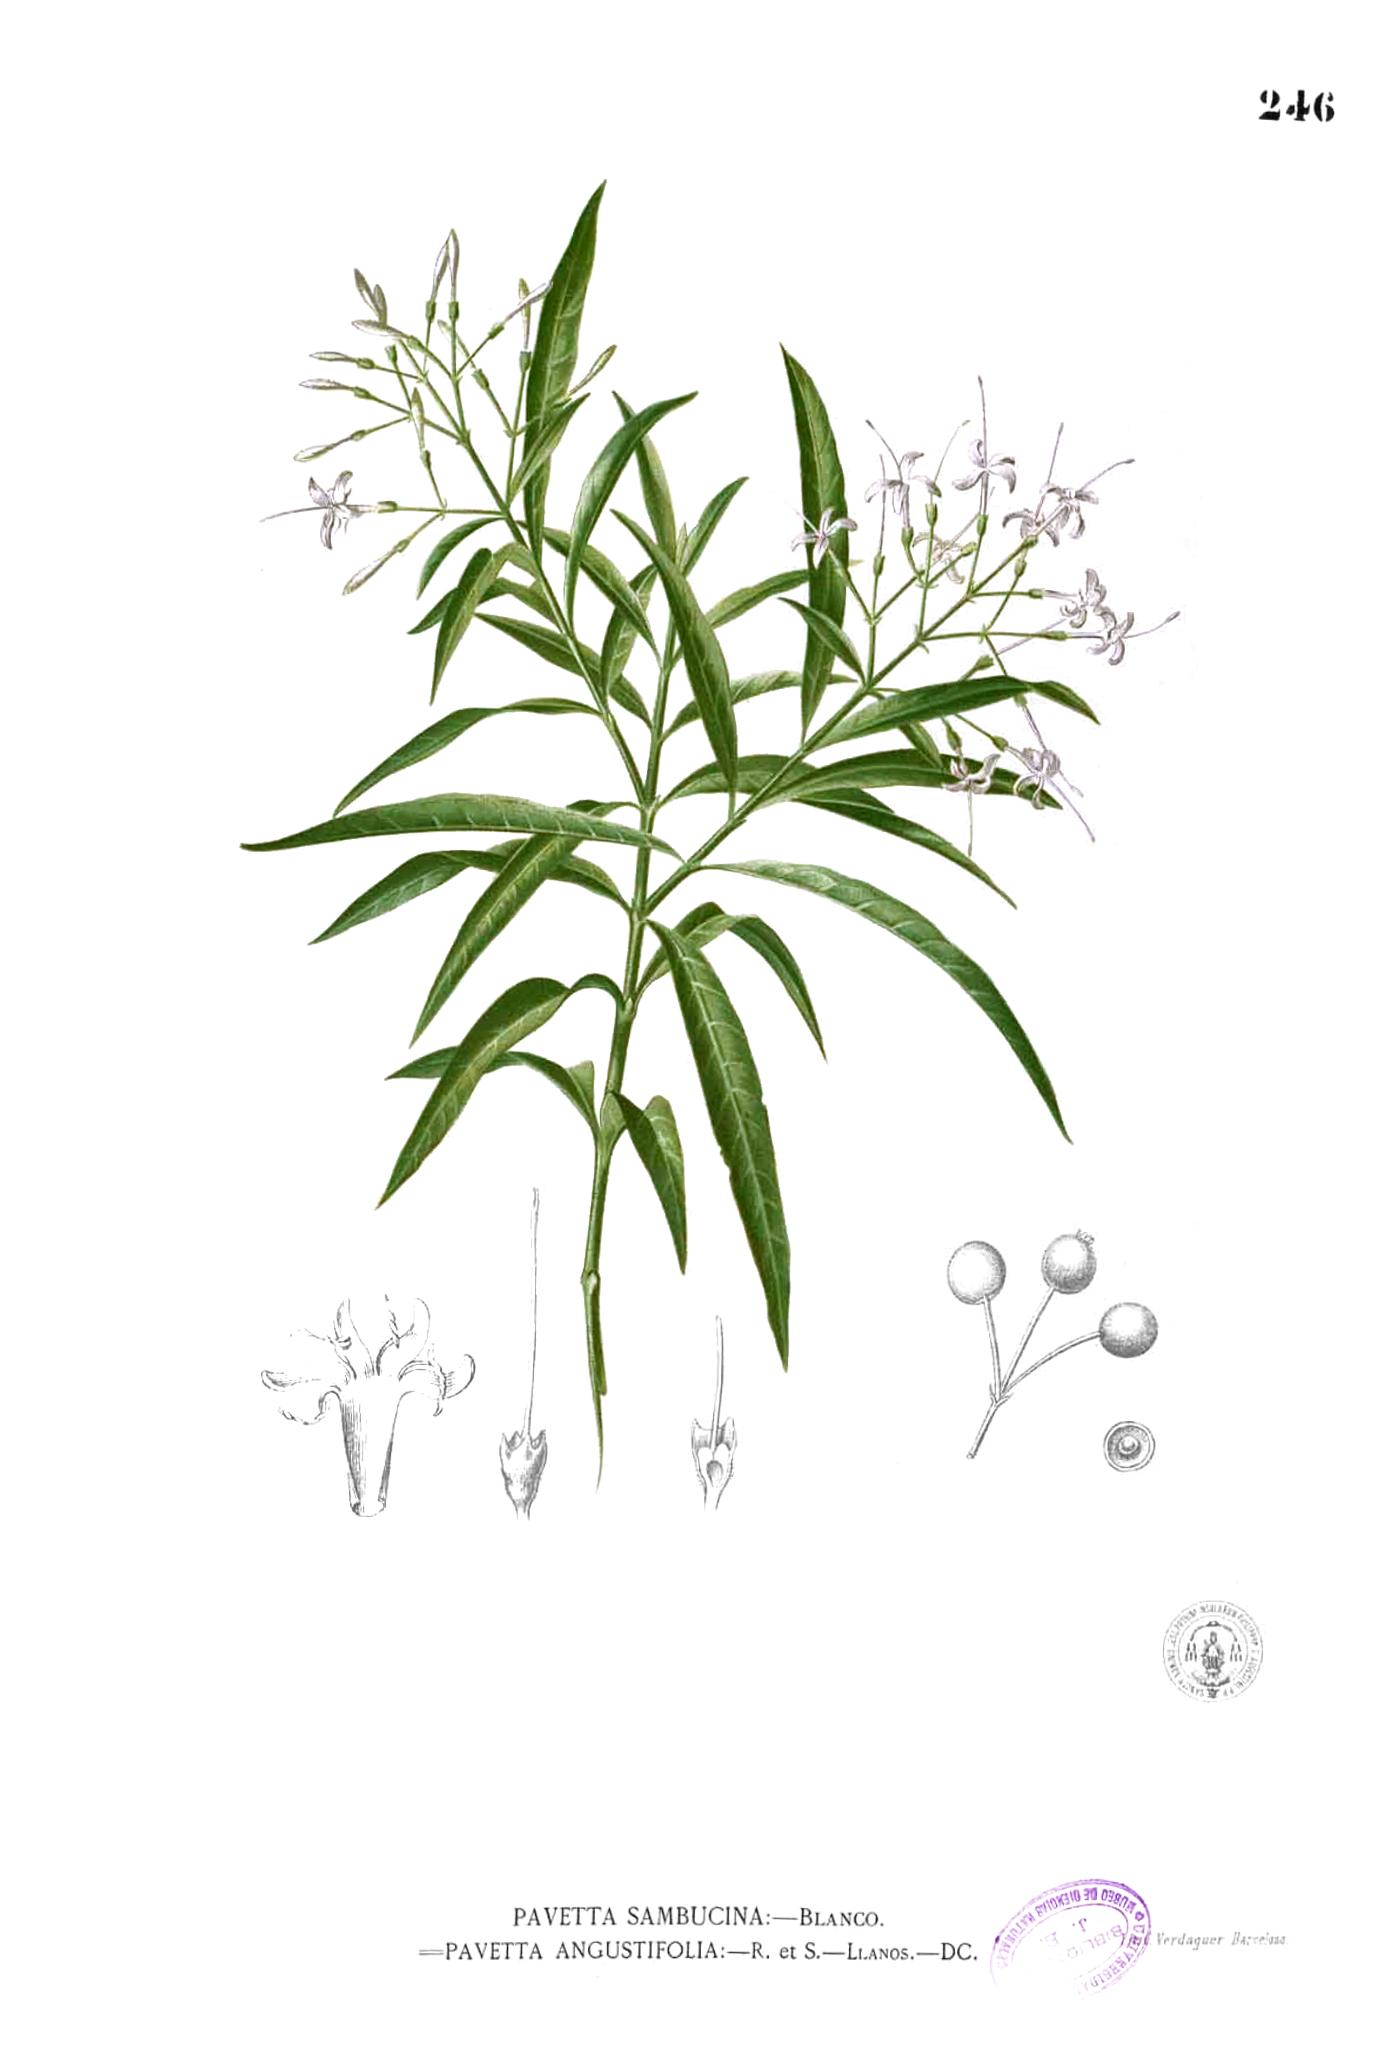 Depiction of Pavetta